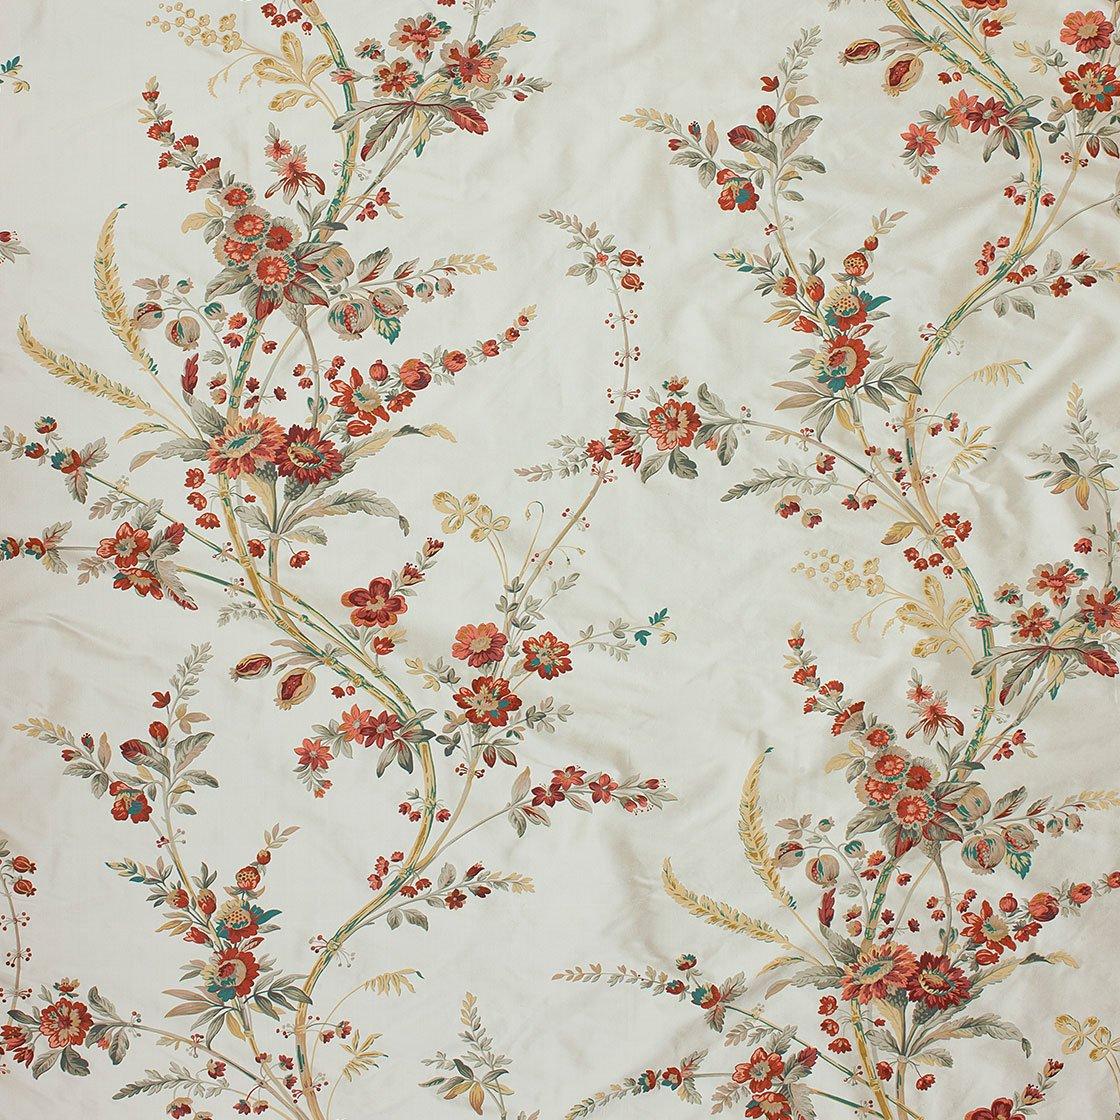 Amelia Printed Silk - Firebrick - Beaumont & Fletcher - Beaumont & Fletcher